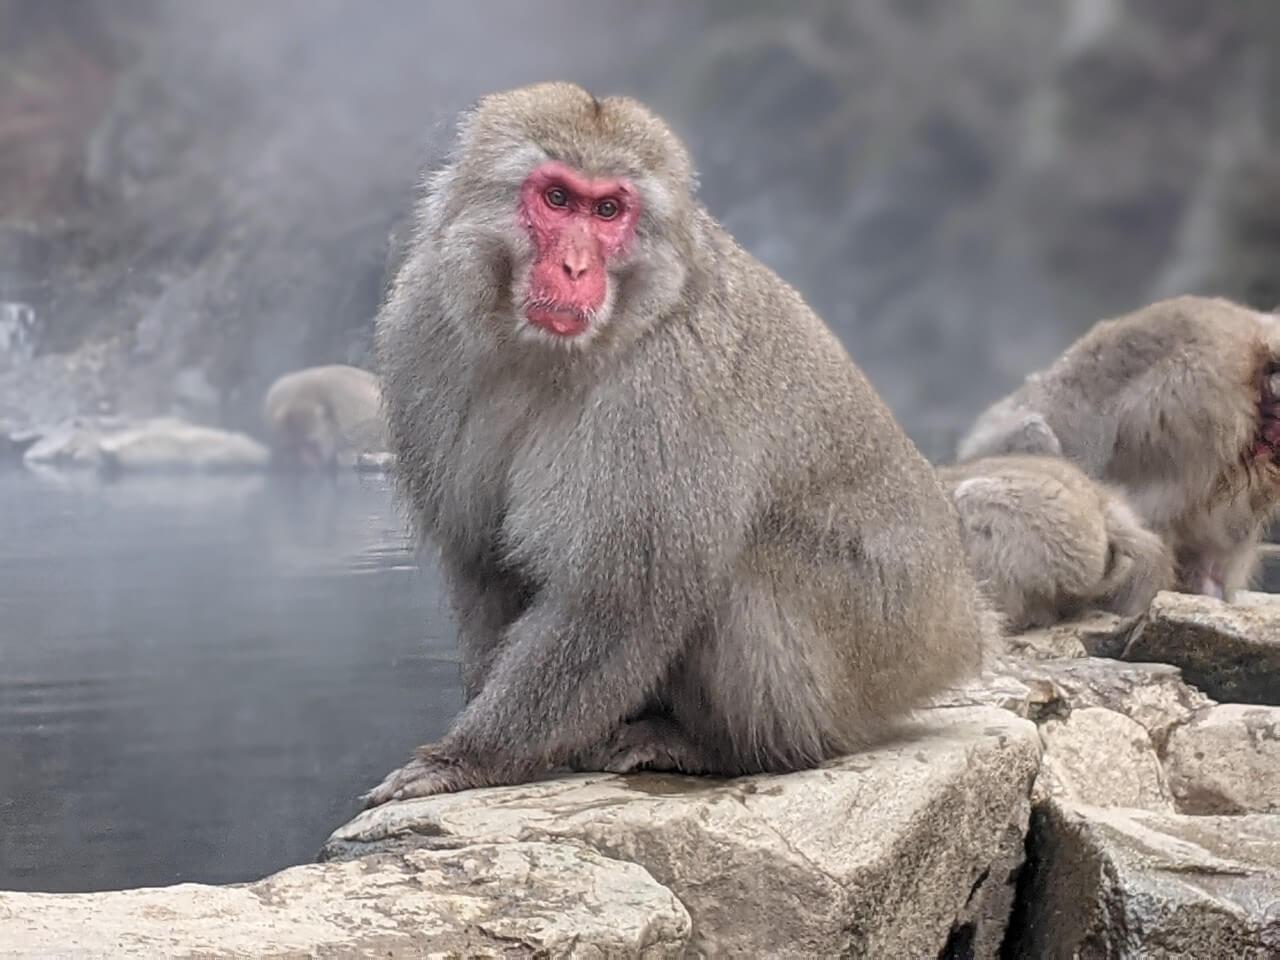 jigokudani-monkey-park-december-2020